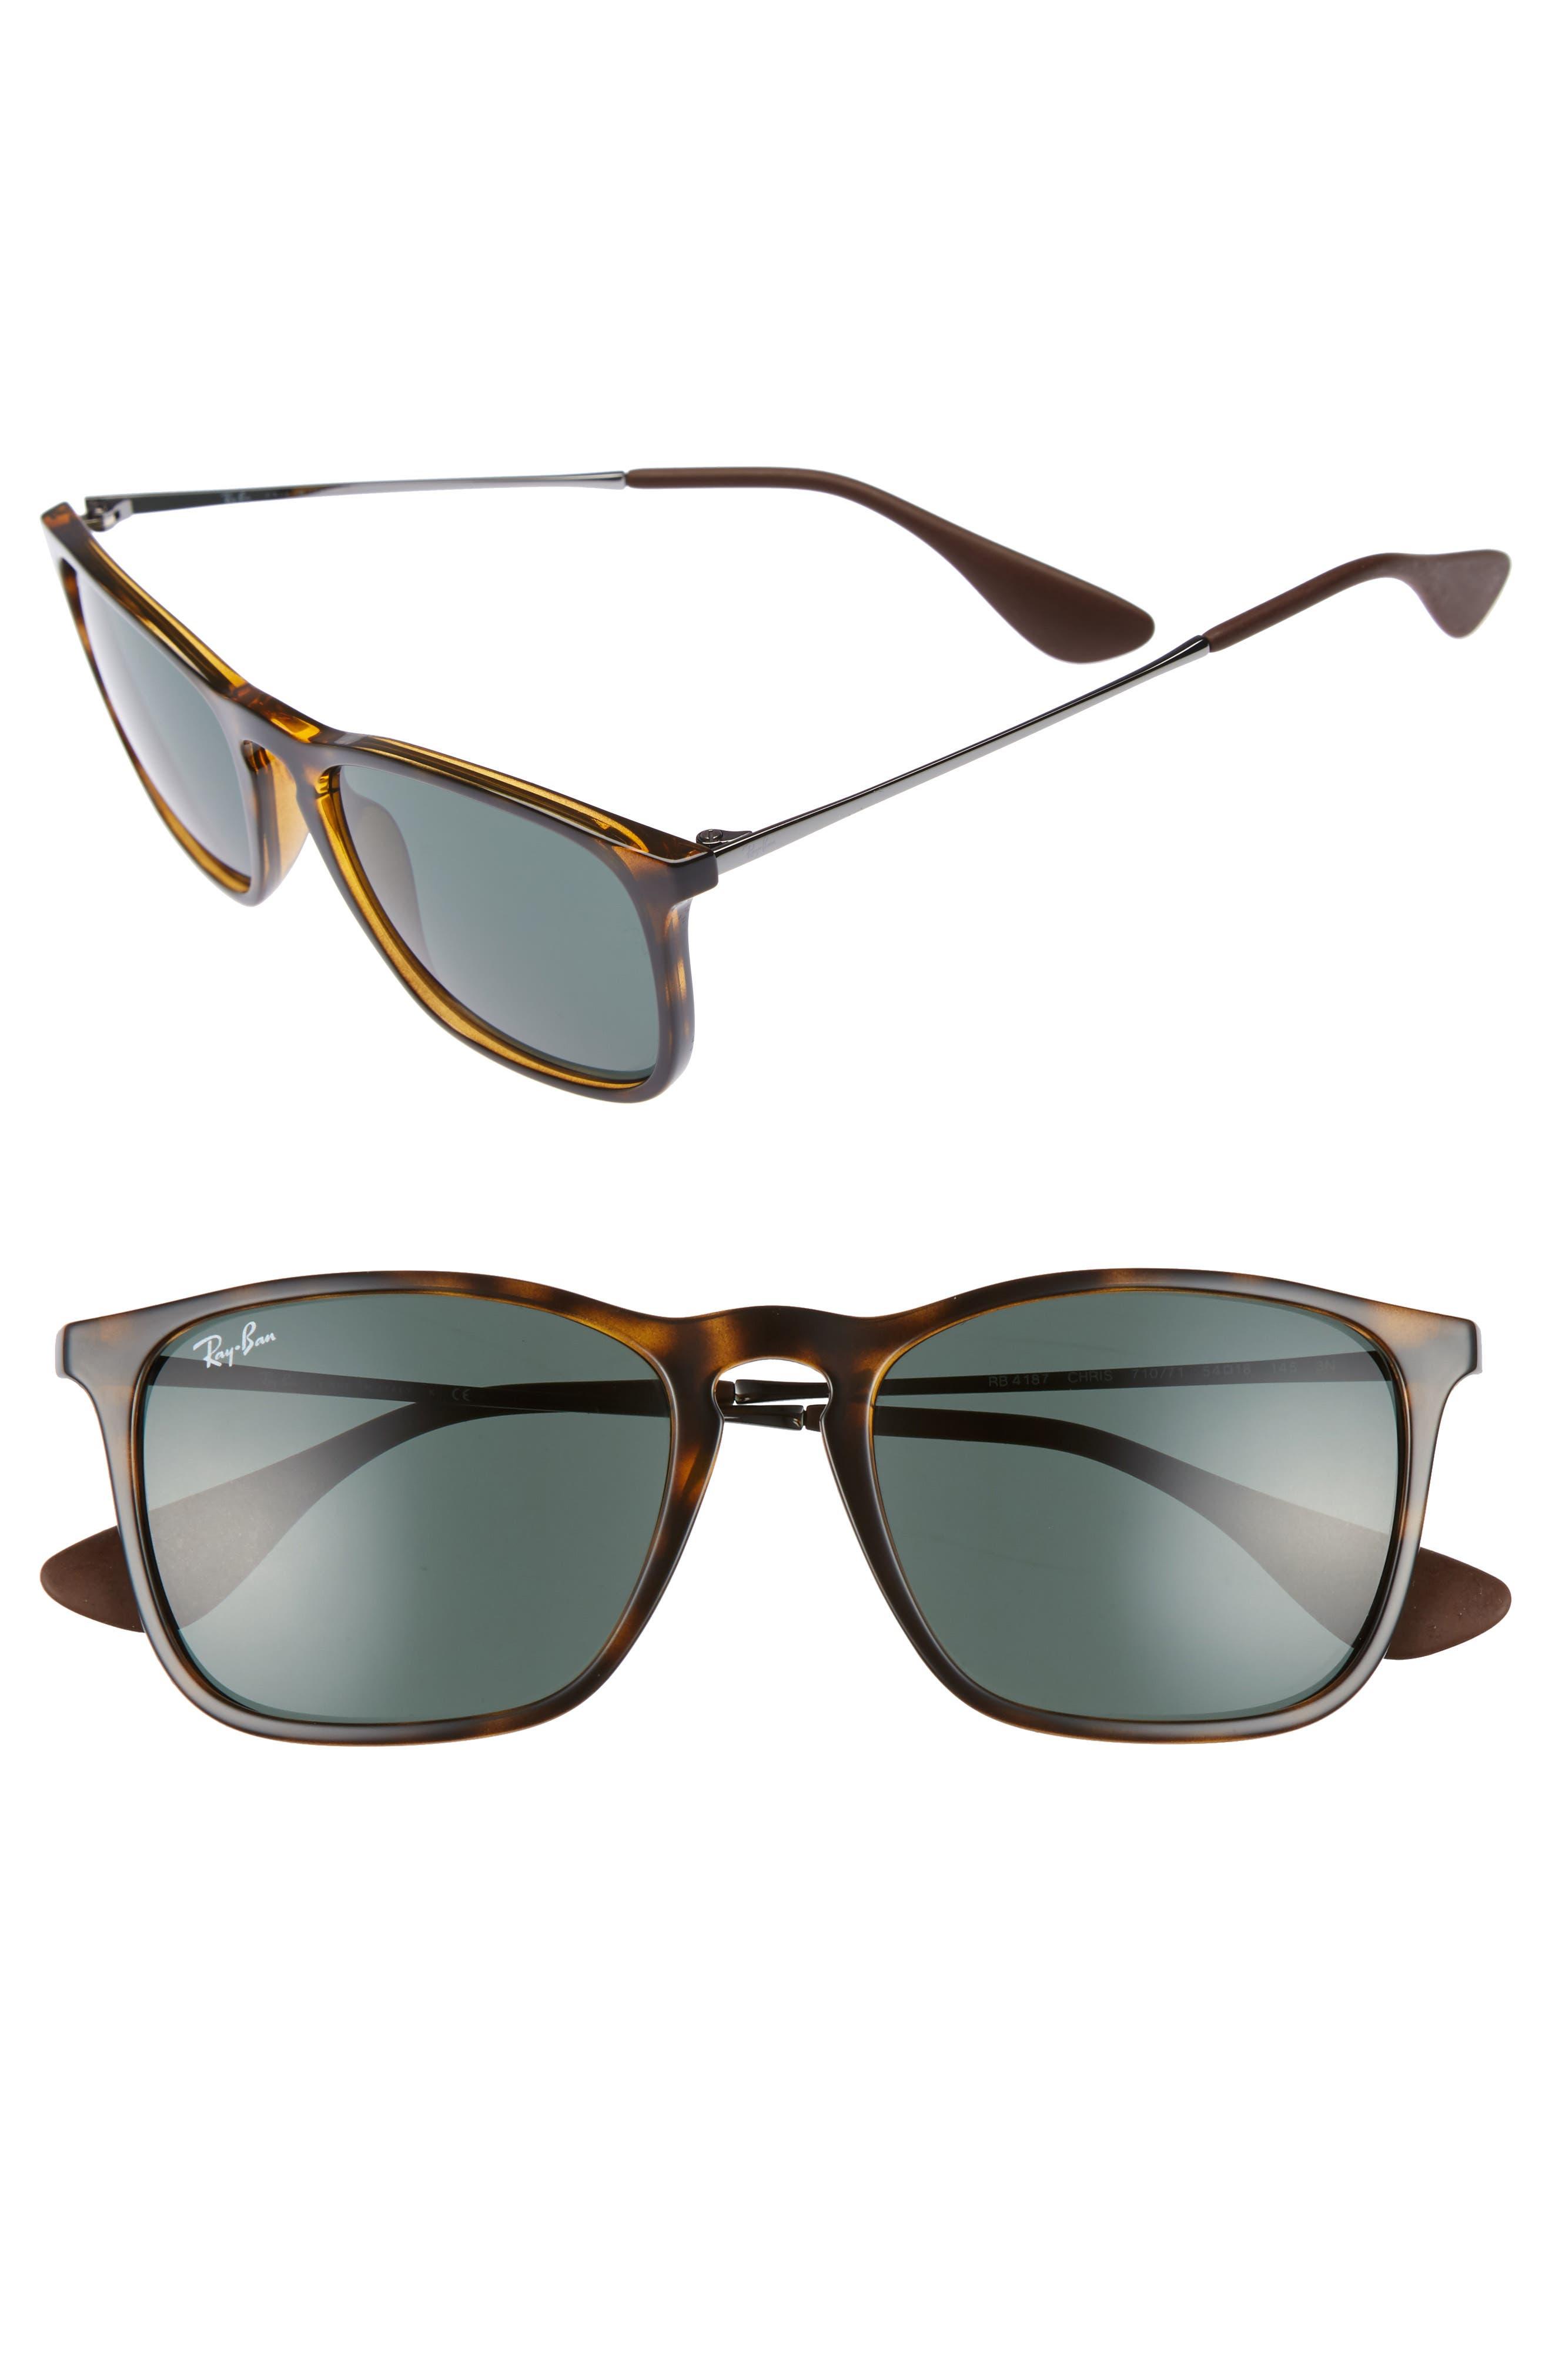 Ray-Ban 54mm Sunglasses